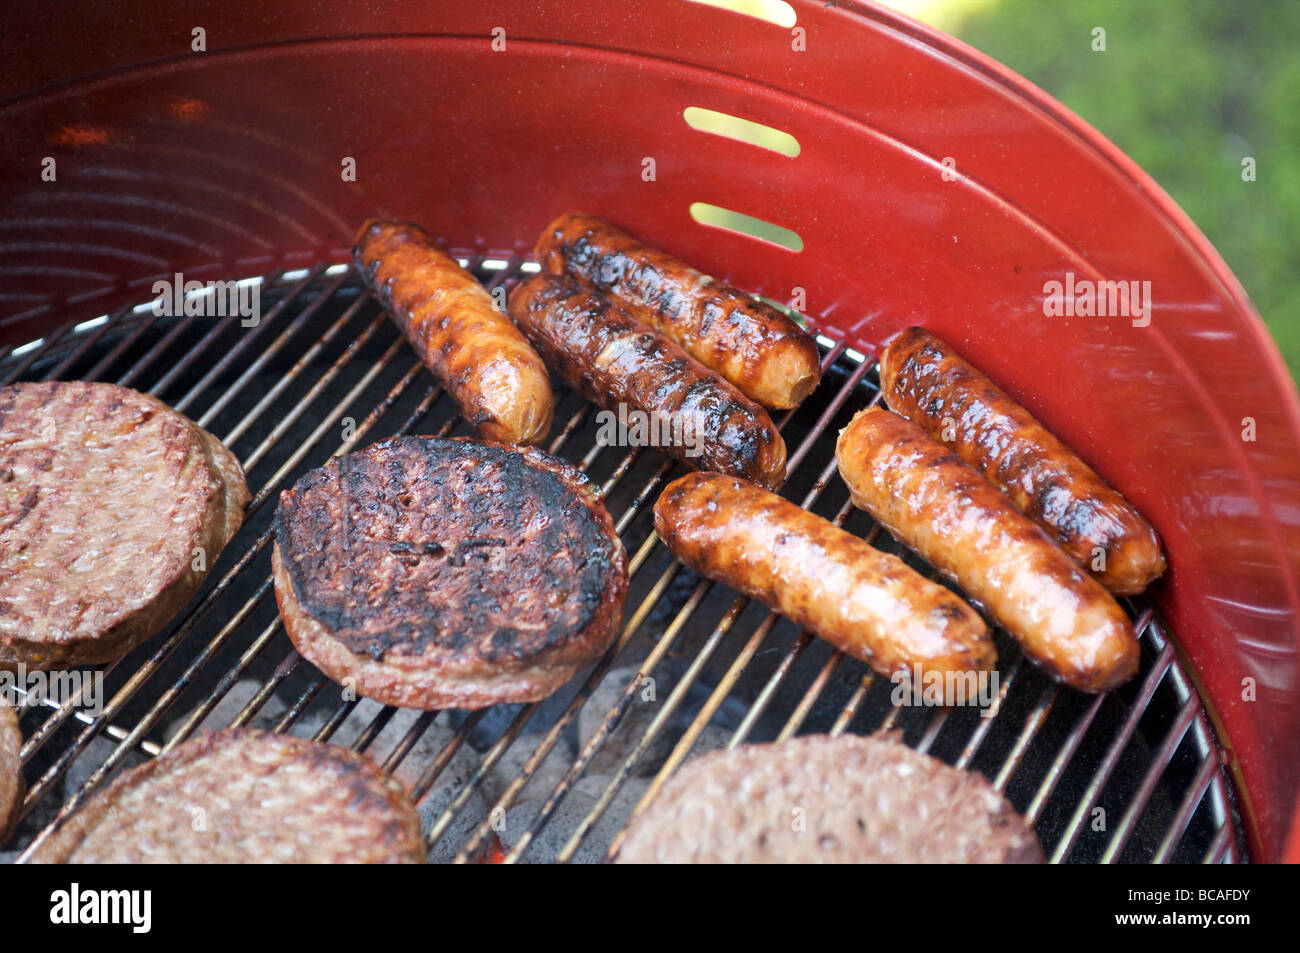 hot dogs stockfotos hot dogs bilder alamy. Black Bedroom Furniture Sets. Home Design Ideas